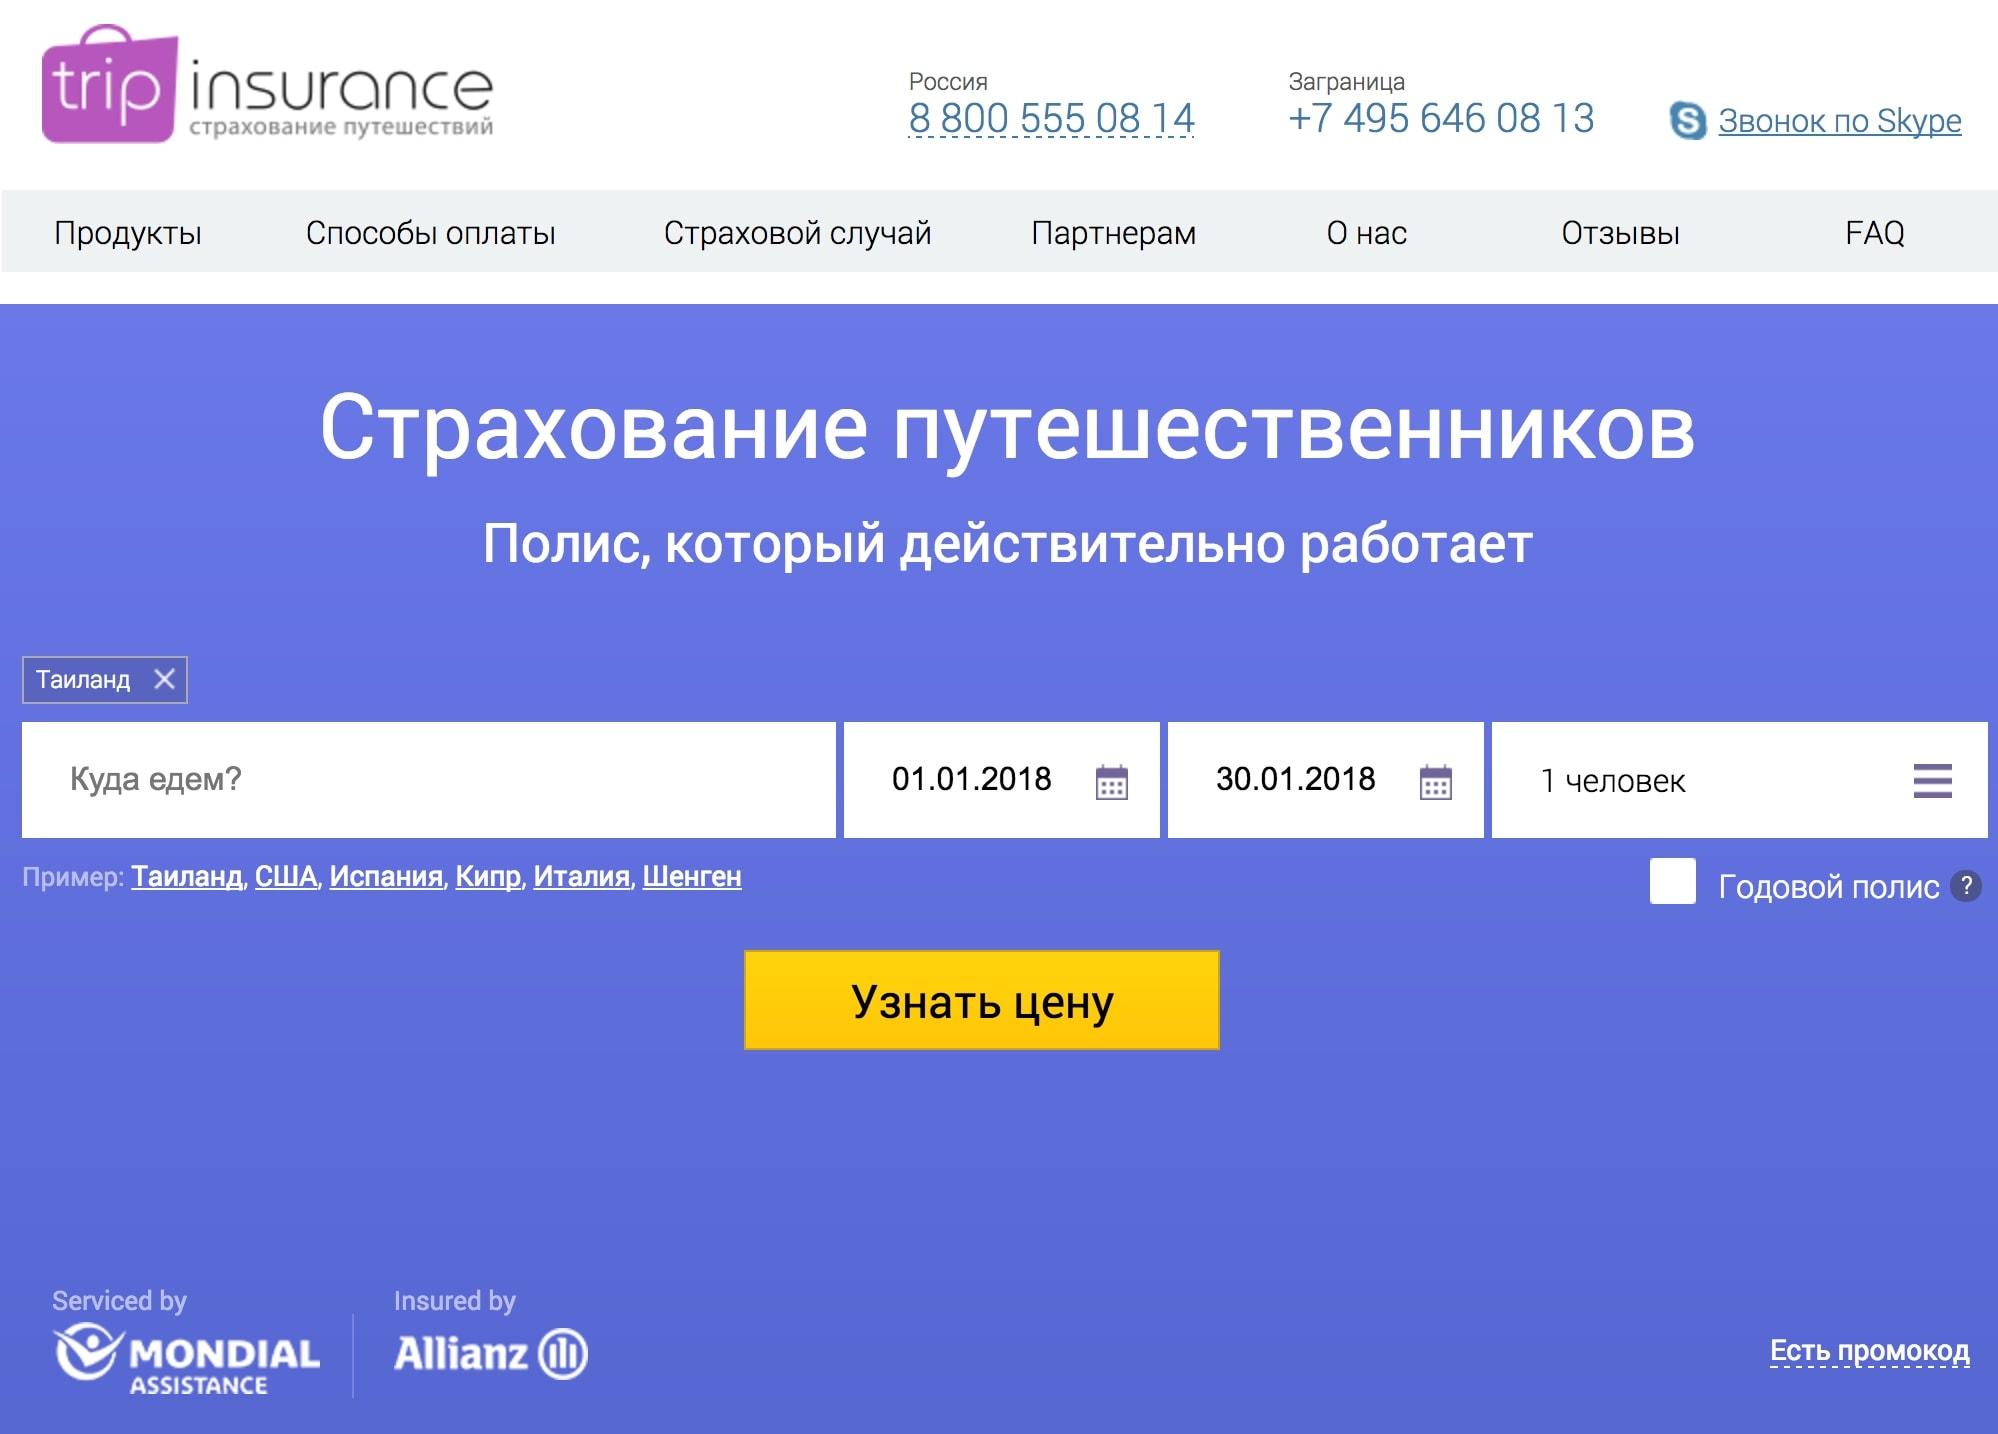 Картинки по запросу Tripinsurance.ru обзор